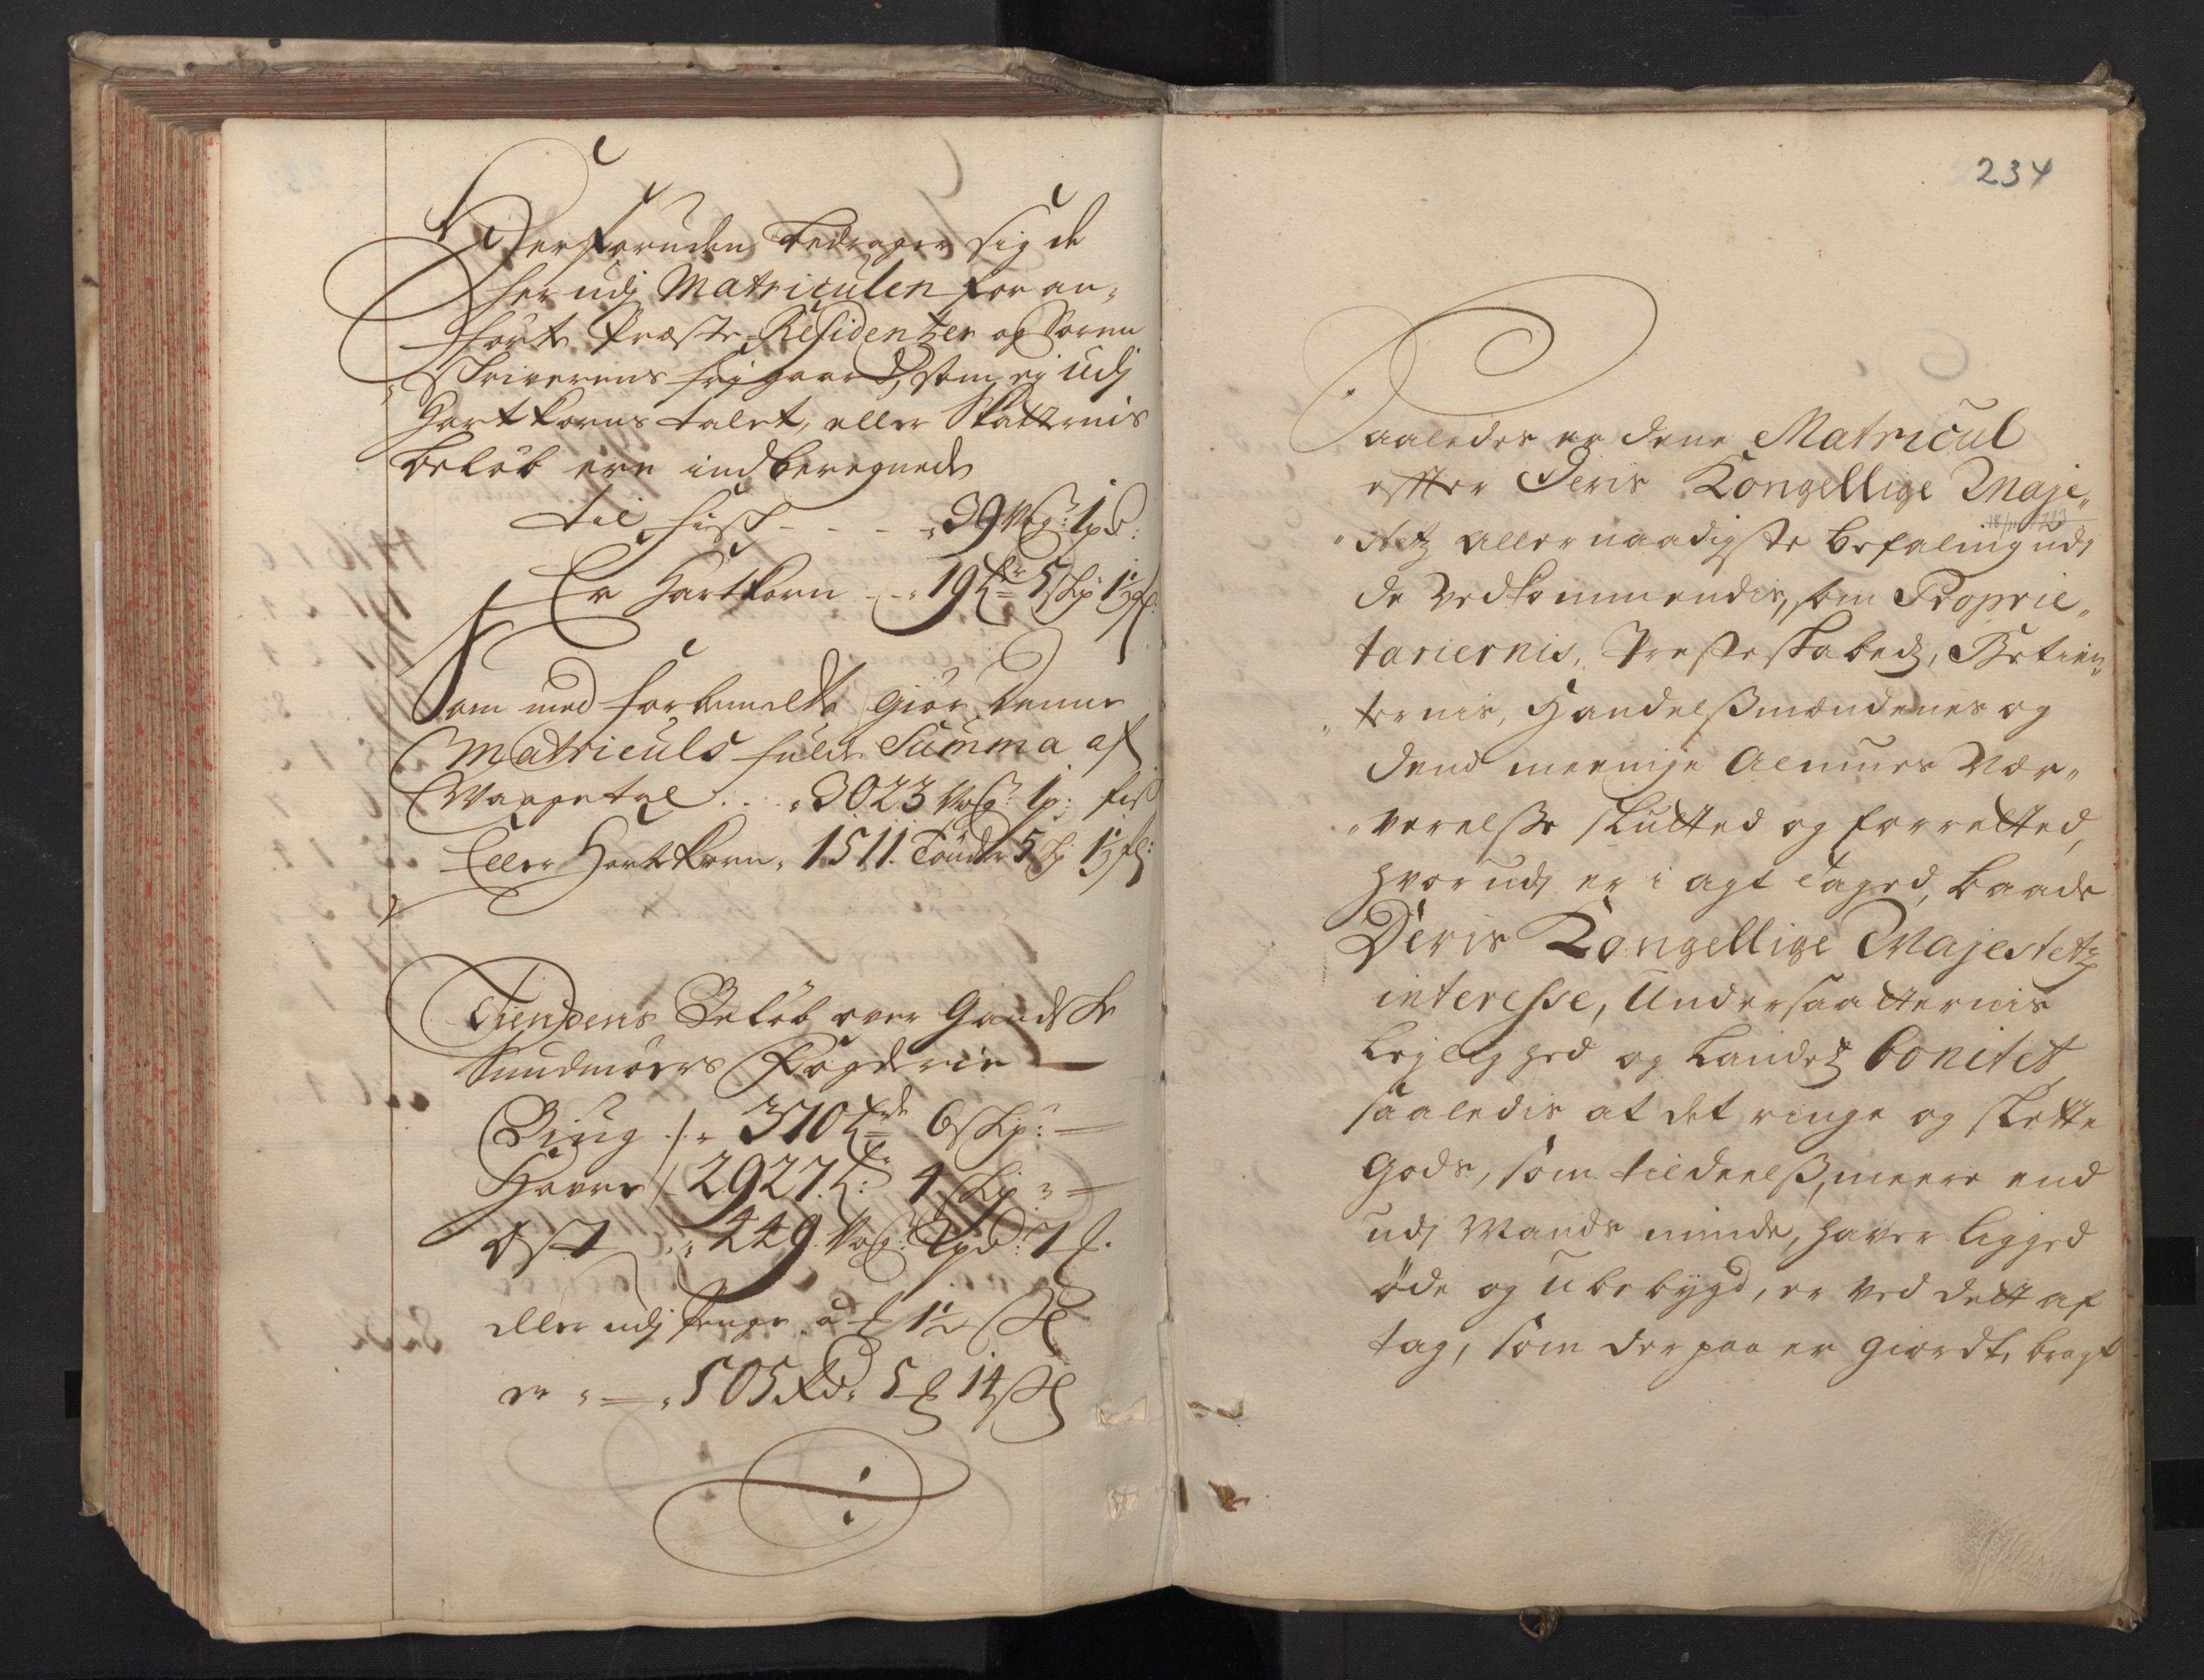 RA, Rentekammeret inntil 1814, Realistisk ordnet avdeling, N/Nb/Nbf/L0148: Sunnmøre, prøvematrikkel, 1714, s. 233b-234a